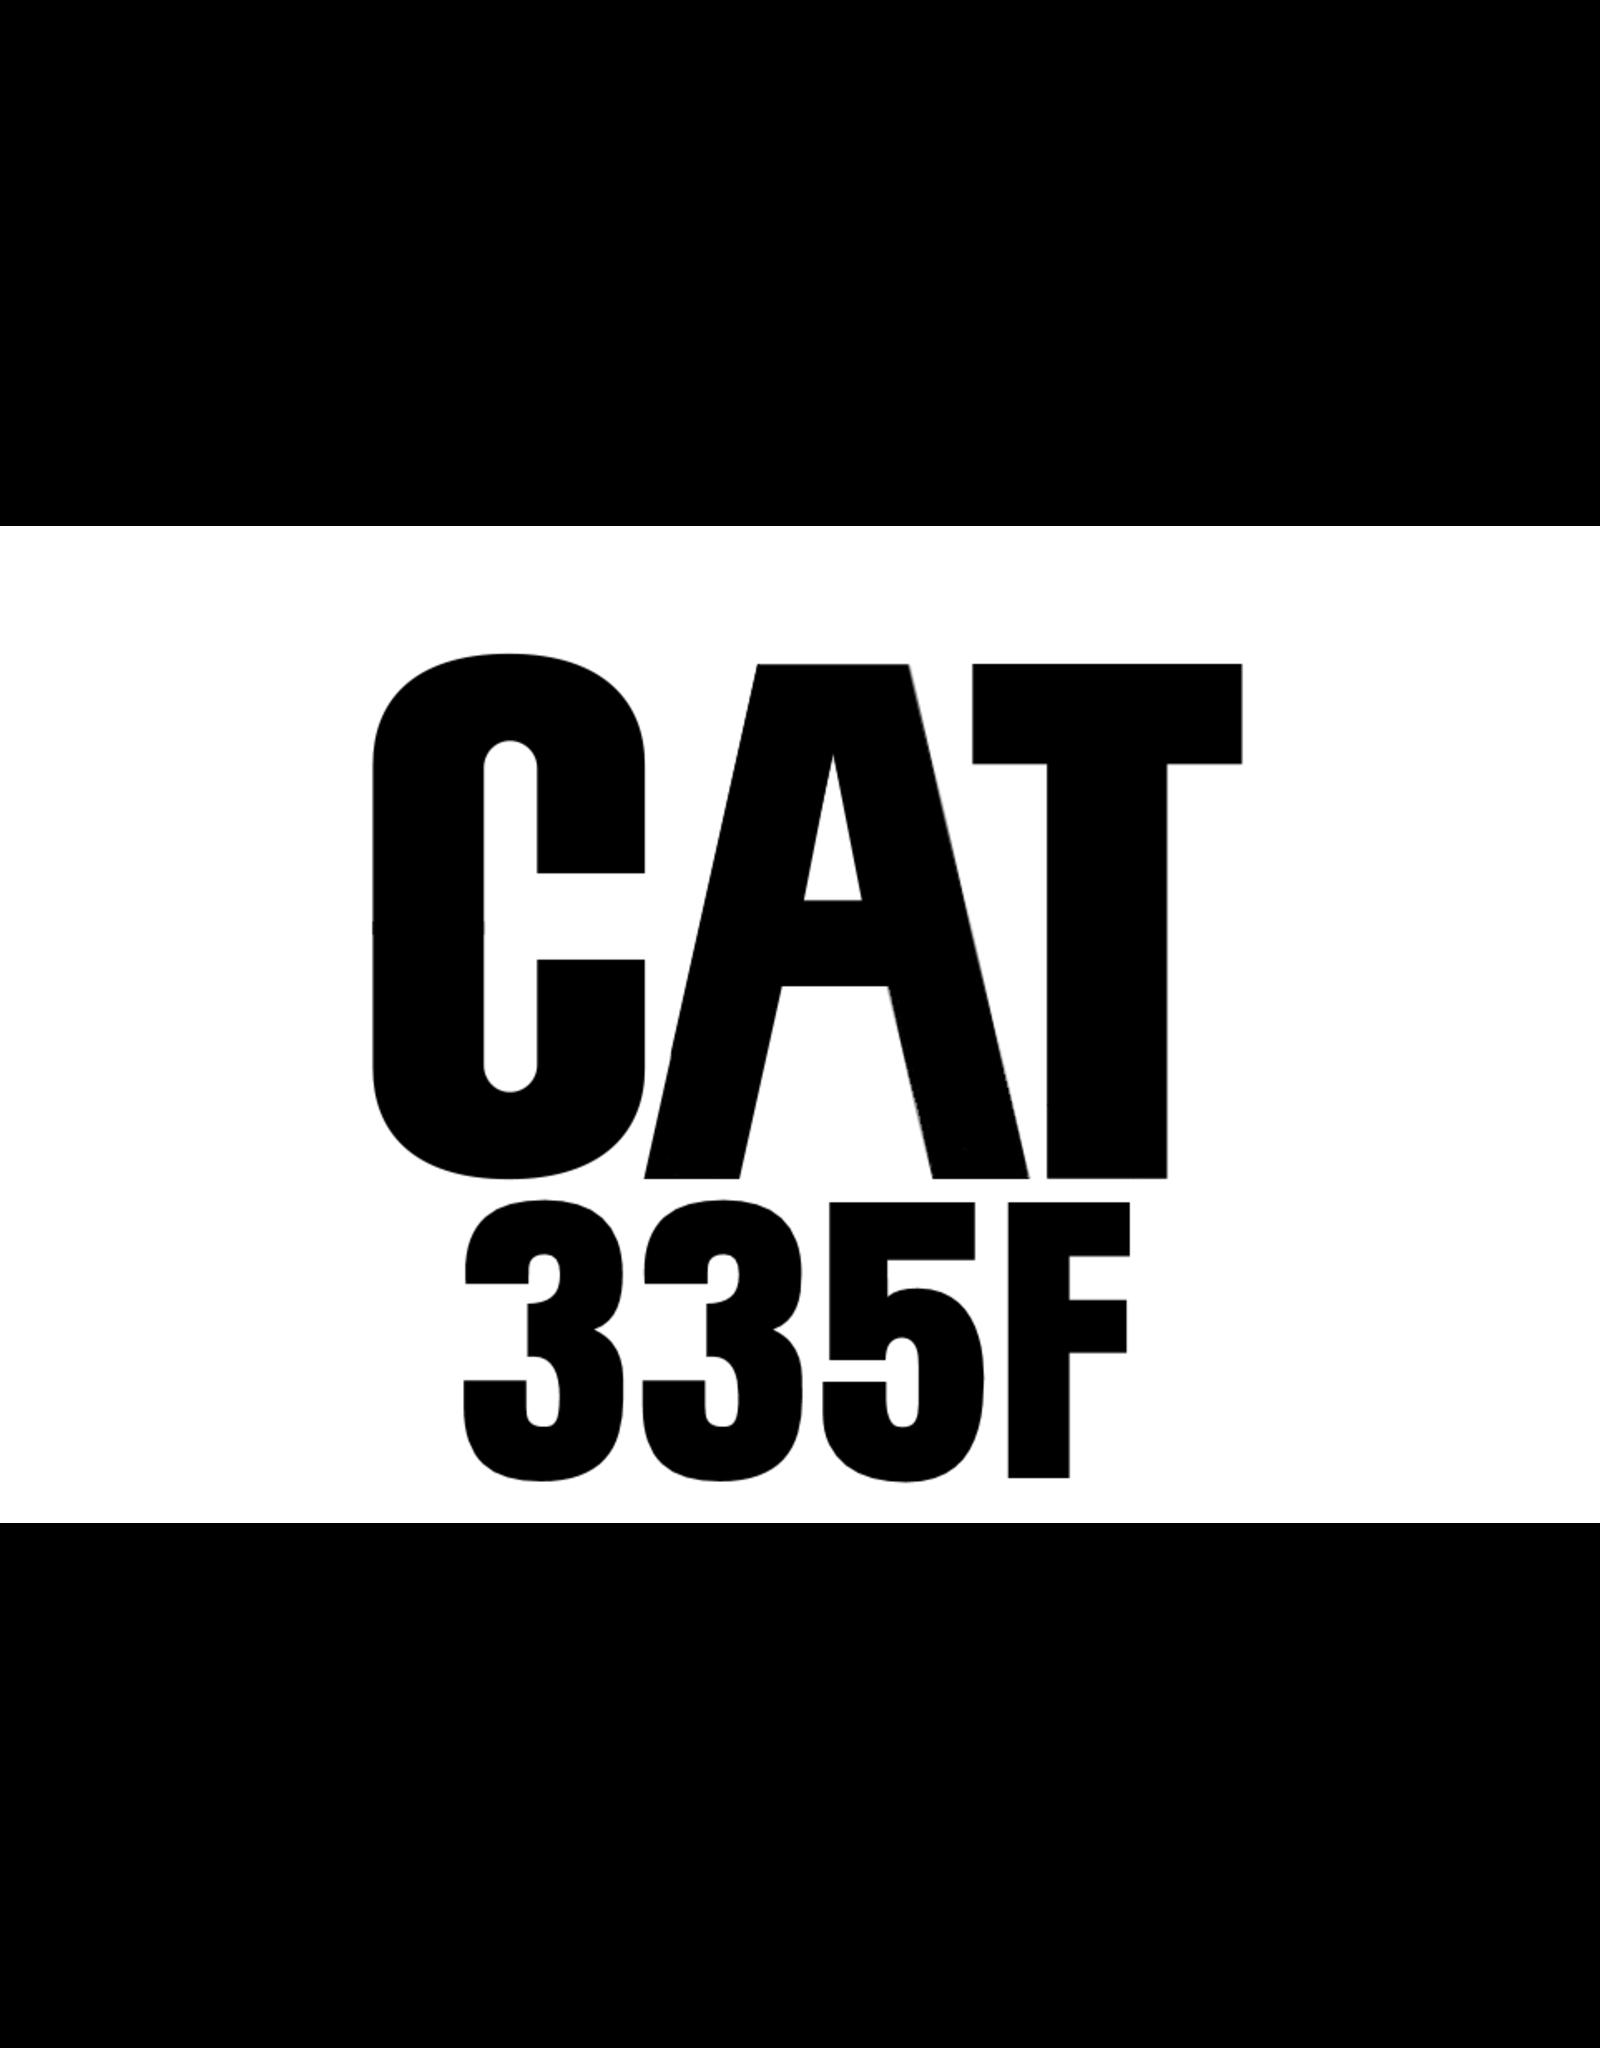 Echle Hartstahl GmbH FOPS for CAT 335F